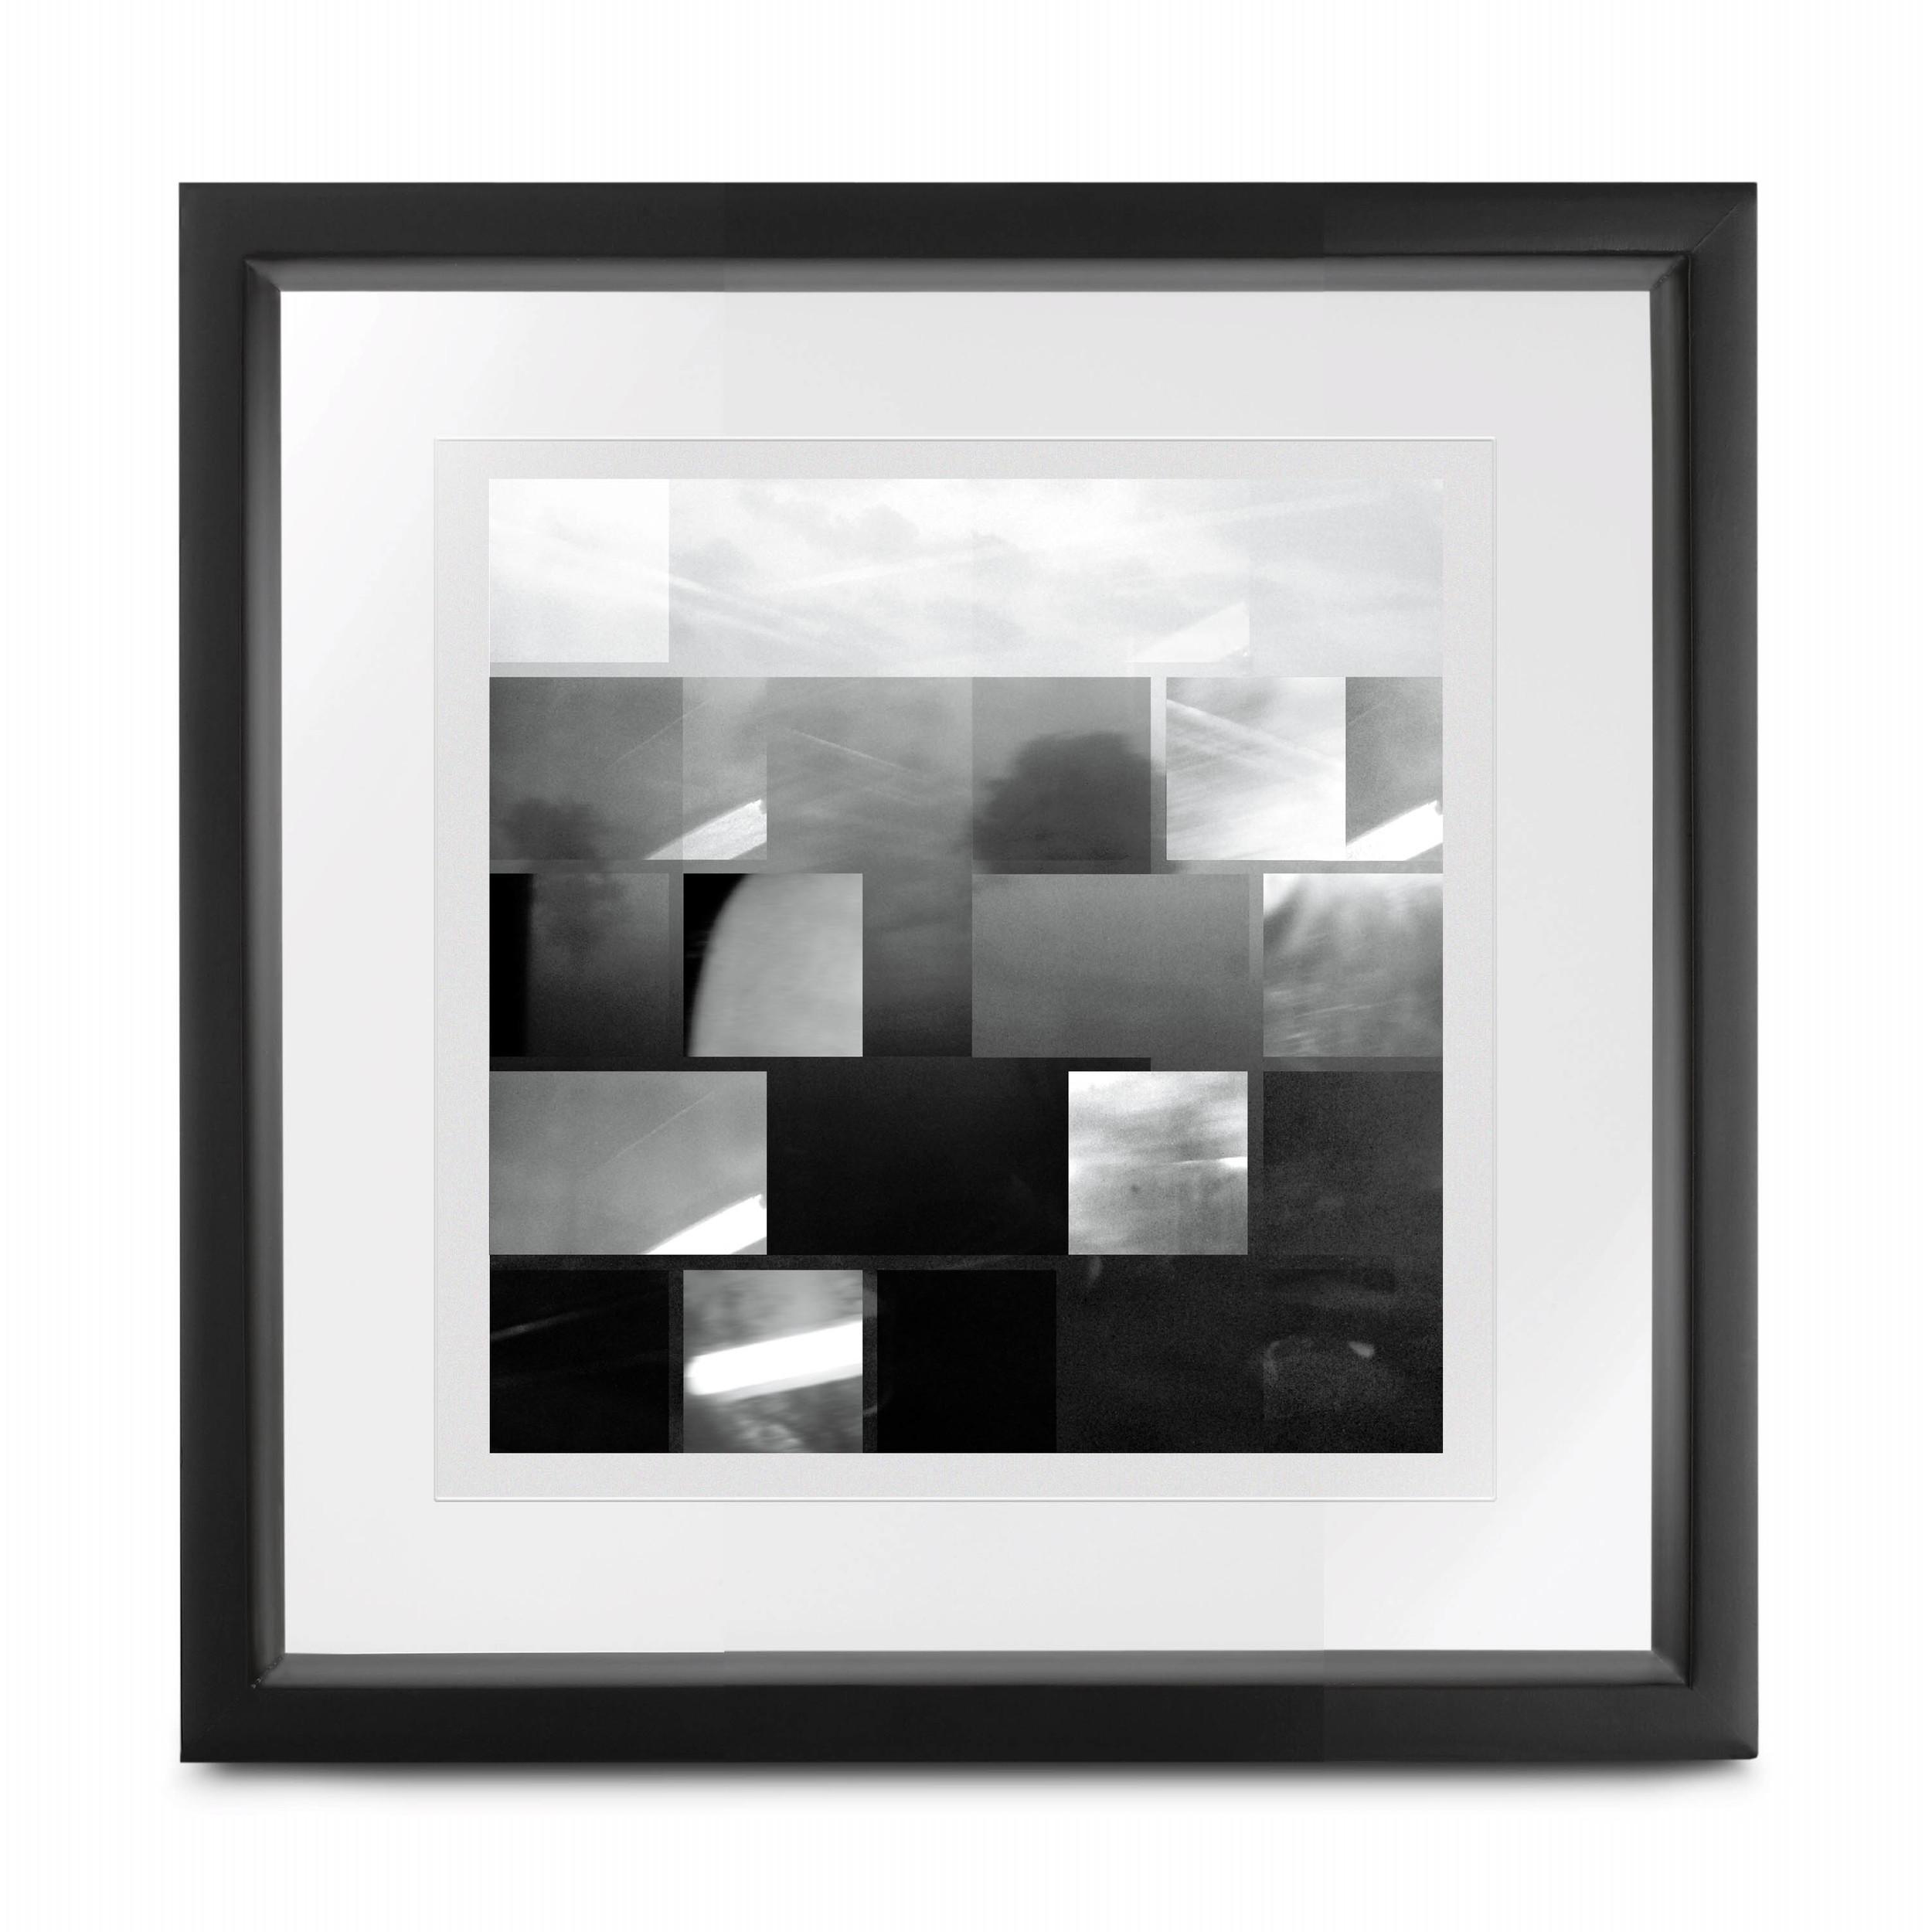 Dream layer I - 2011 - Photography - 30 x 30 cm